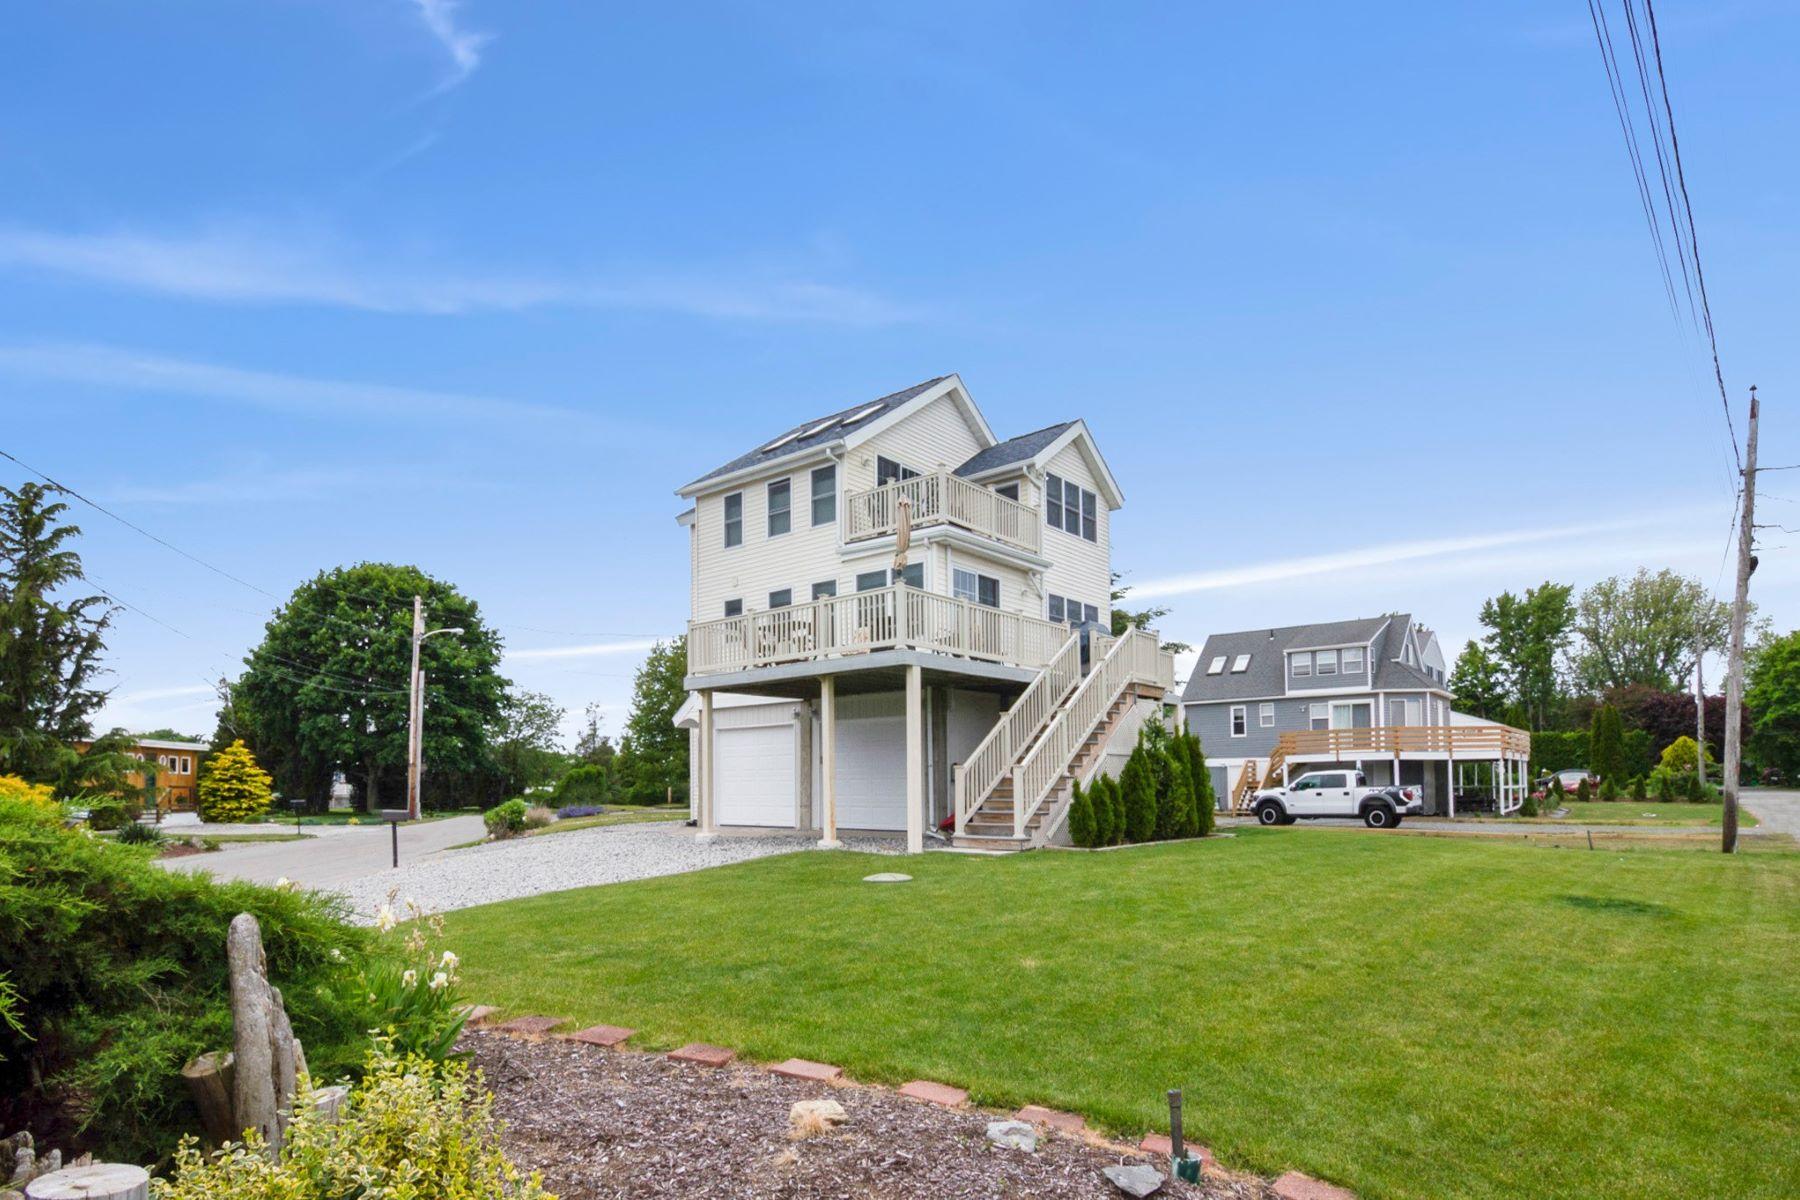 Single Family Homes για την Πώληση στο 47 Old Mill Blvd, Warwick, RI Warwick, Ροουντ Αϊλαντ 02889 Ηνωμένες Πολιτείες